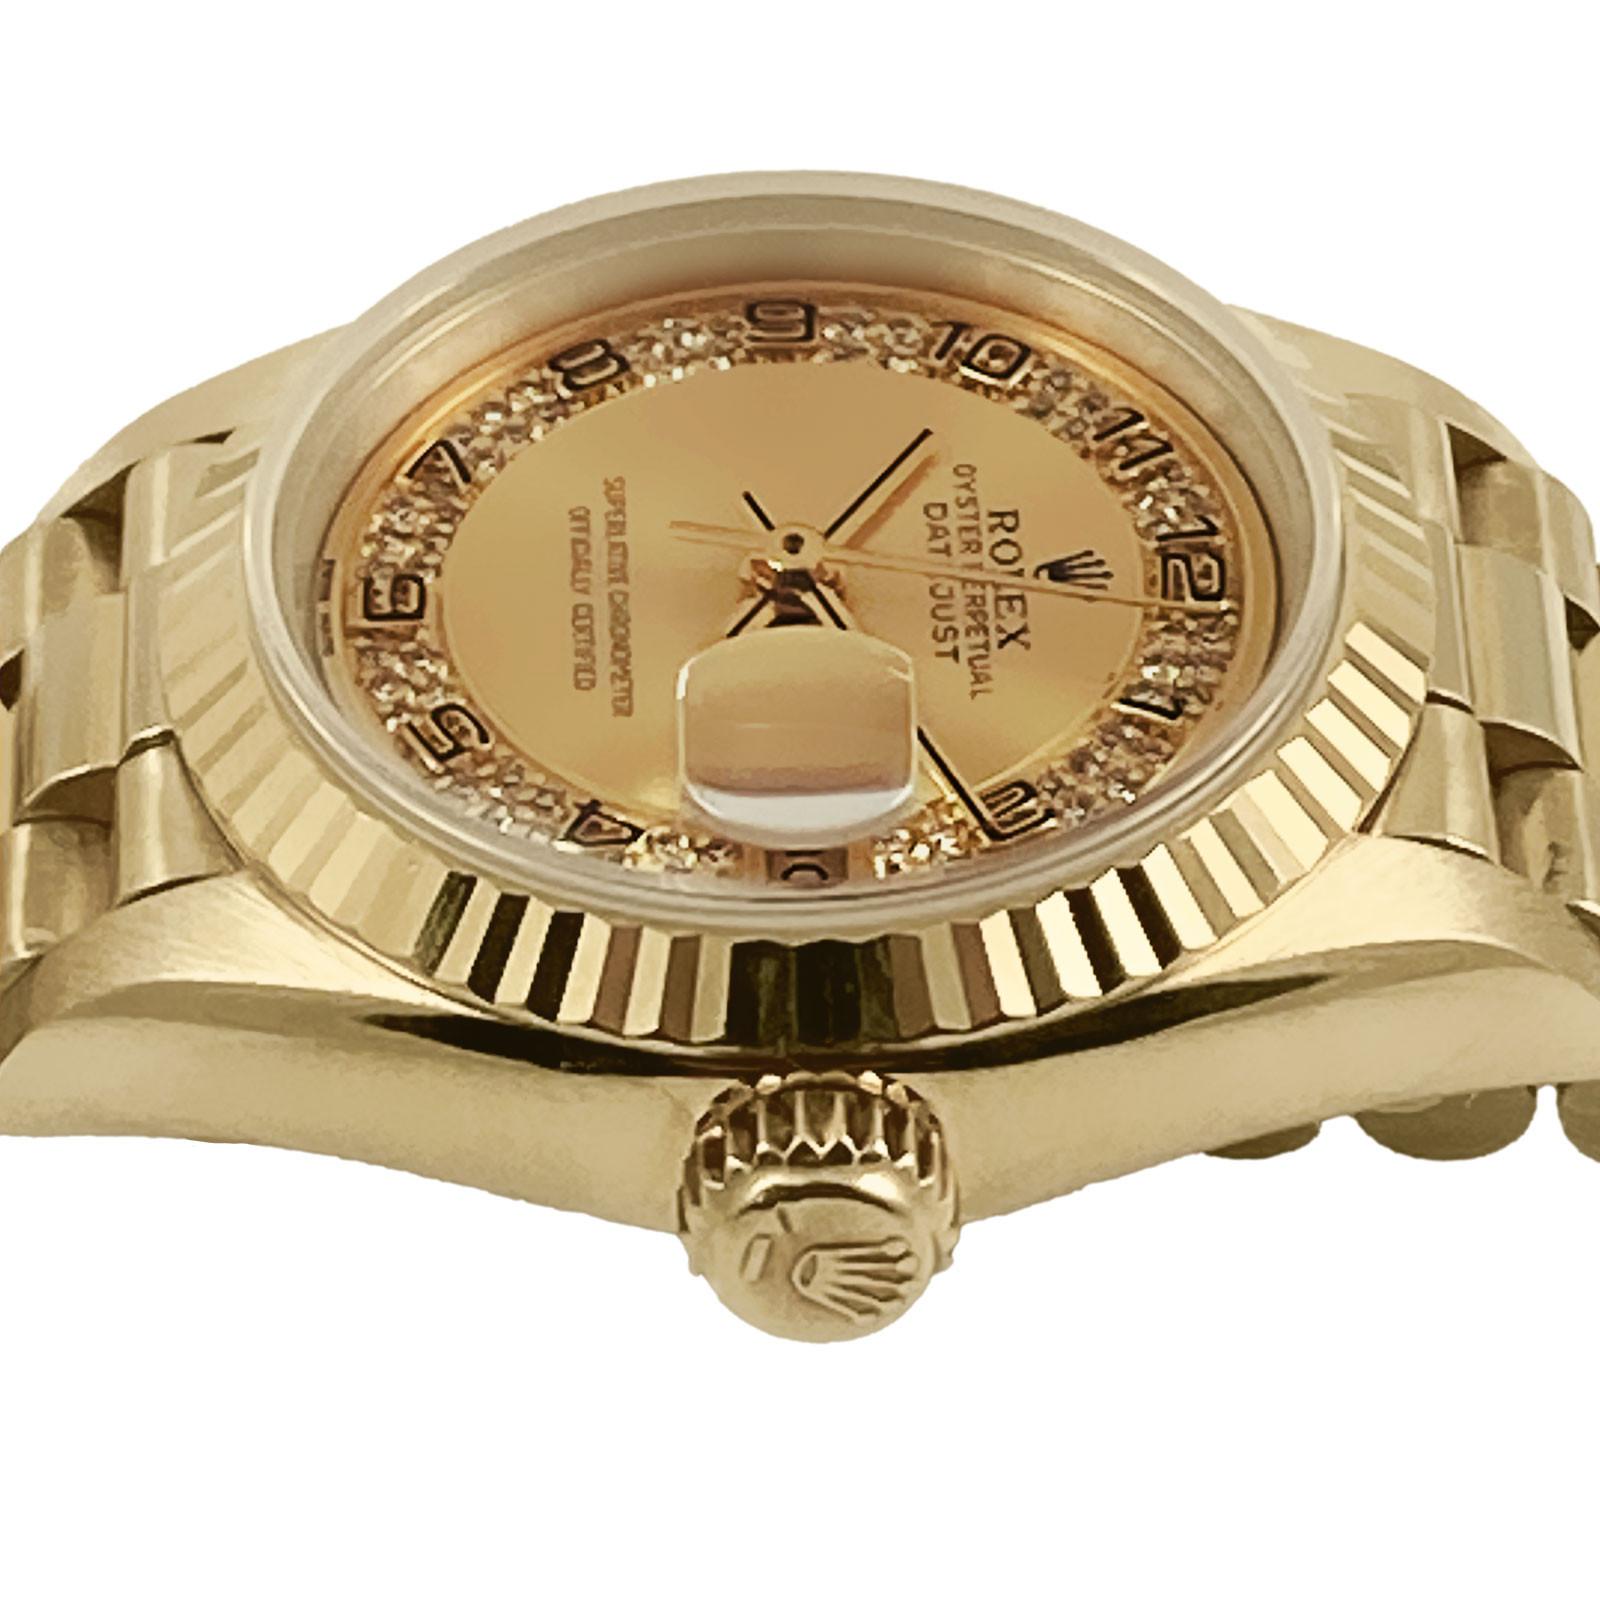 Diamond Rolex Datejust Ref. 69178